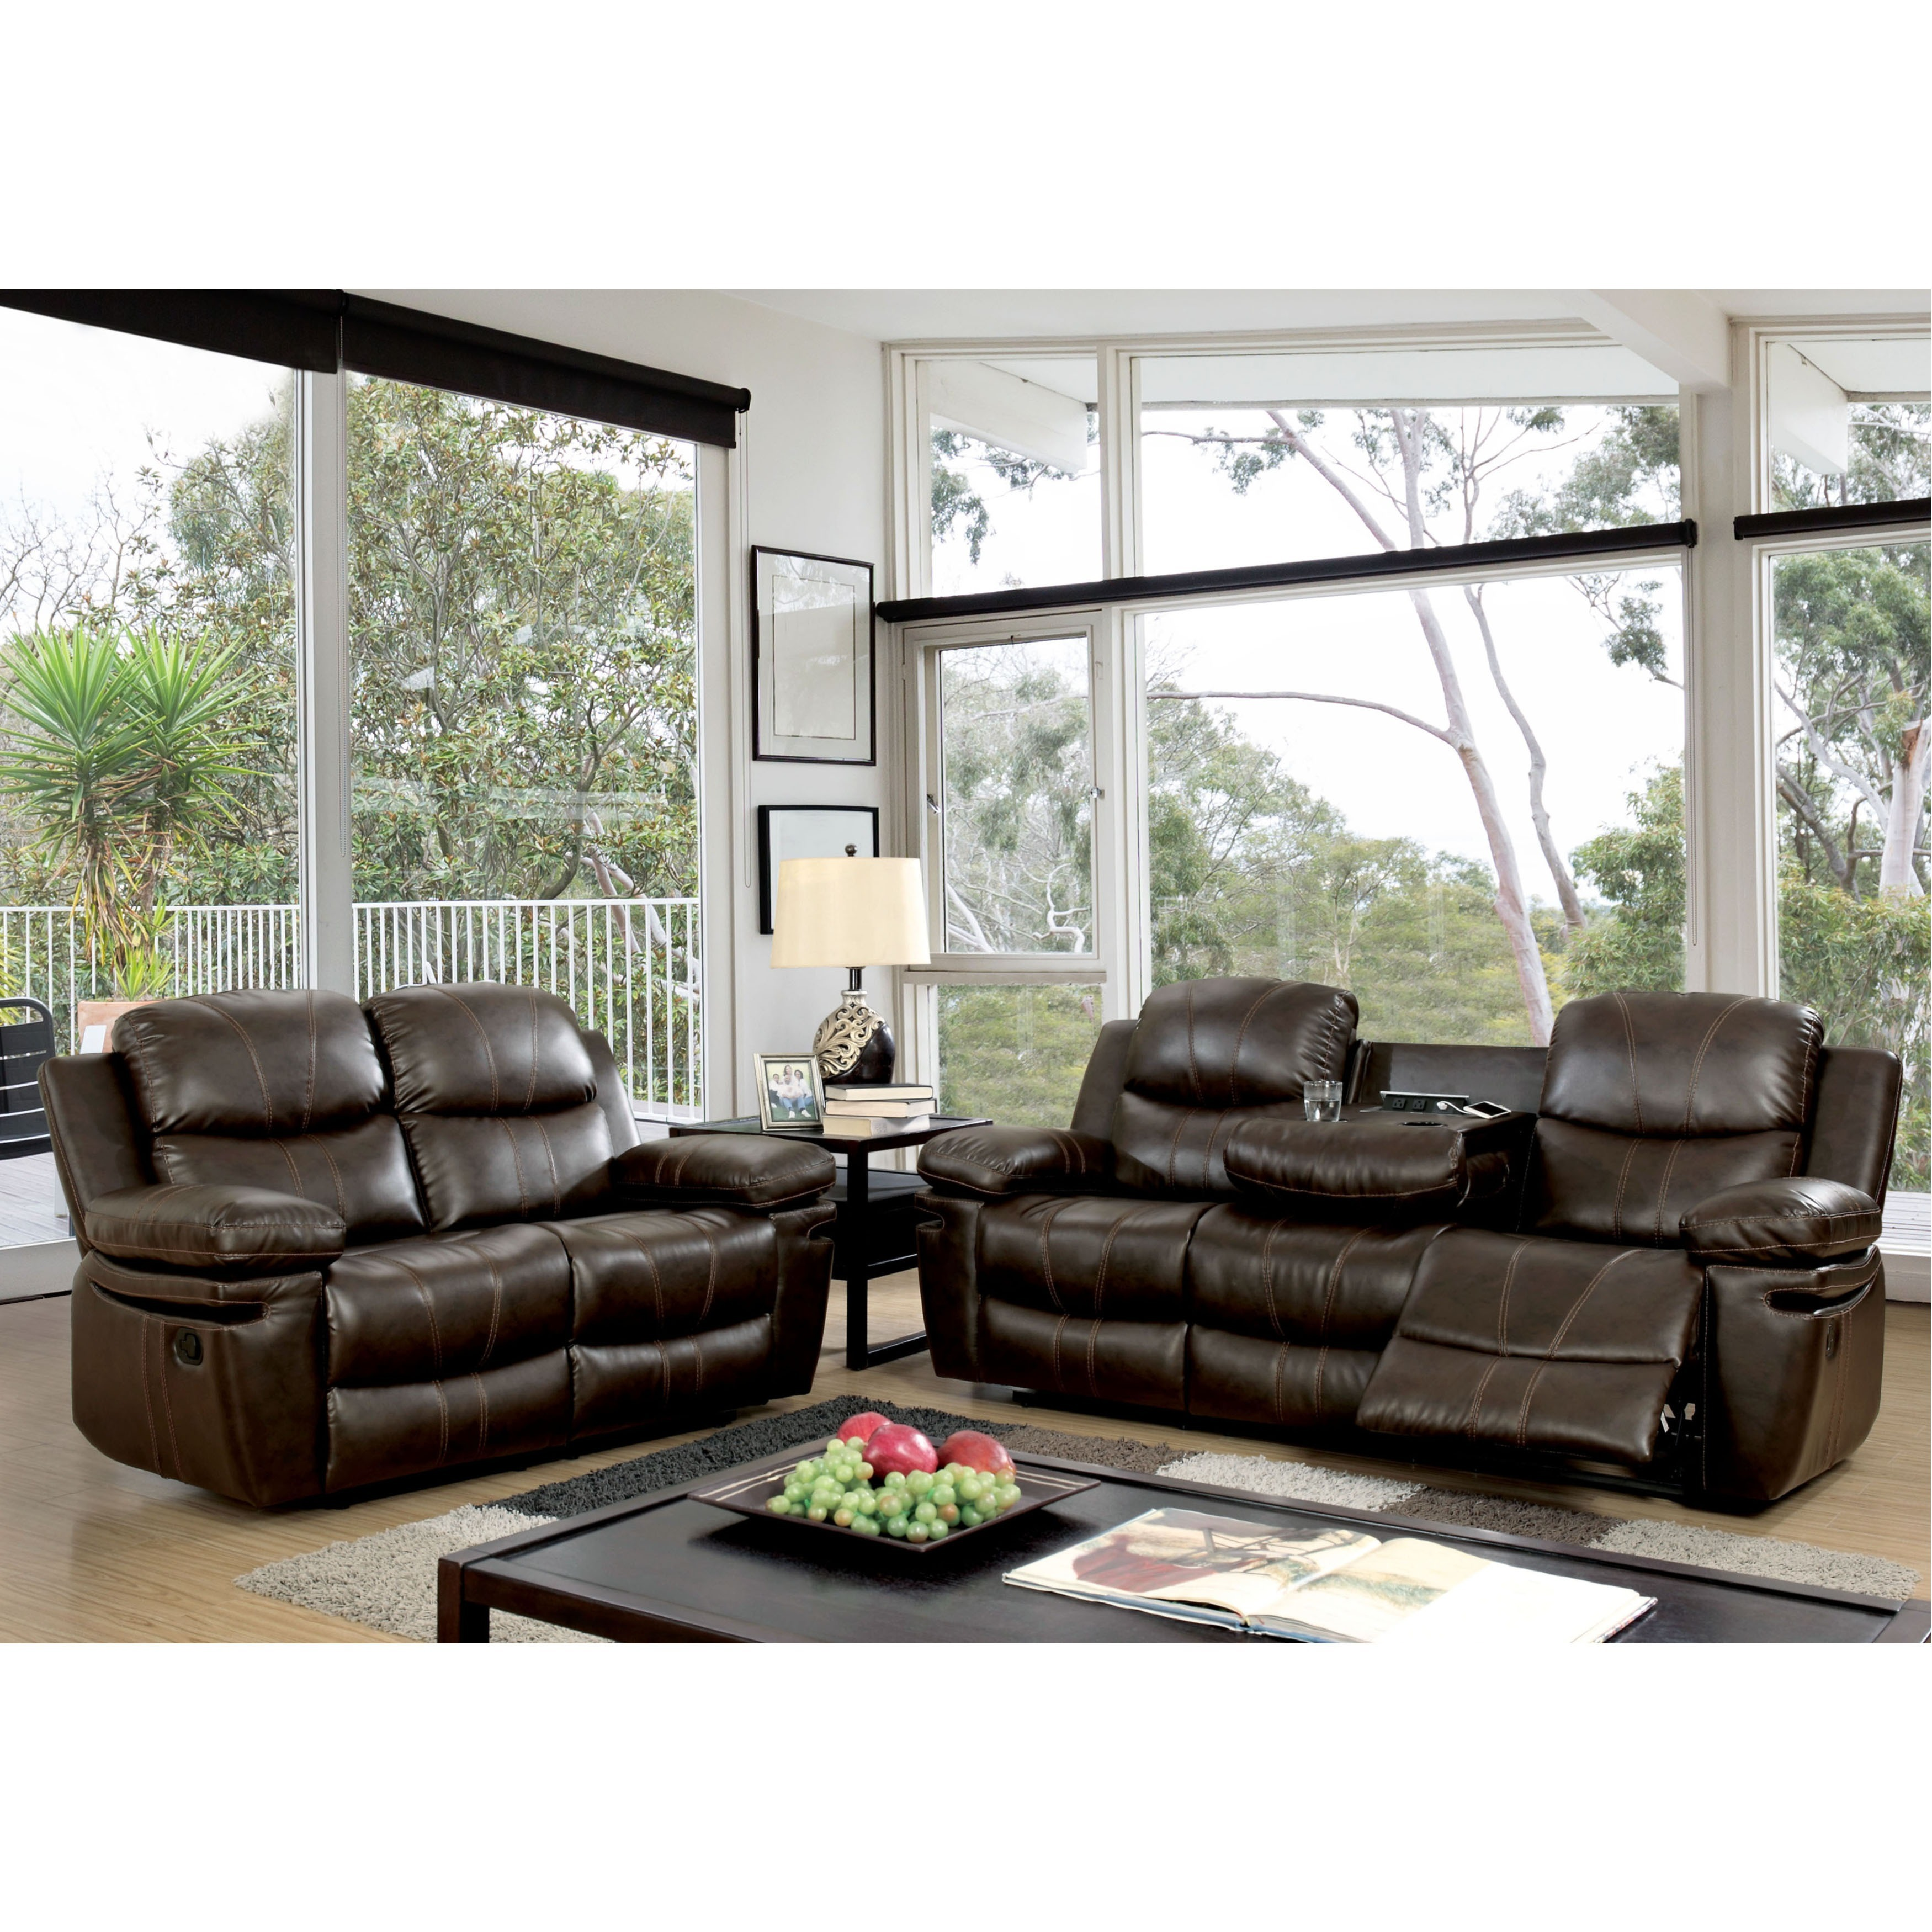 Reclining sofa chair living room sofa modern set recliner - Fabric reclining living room sets ...